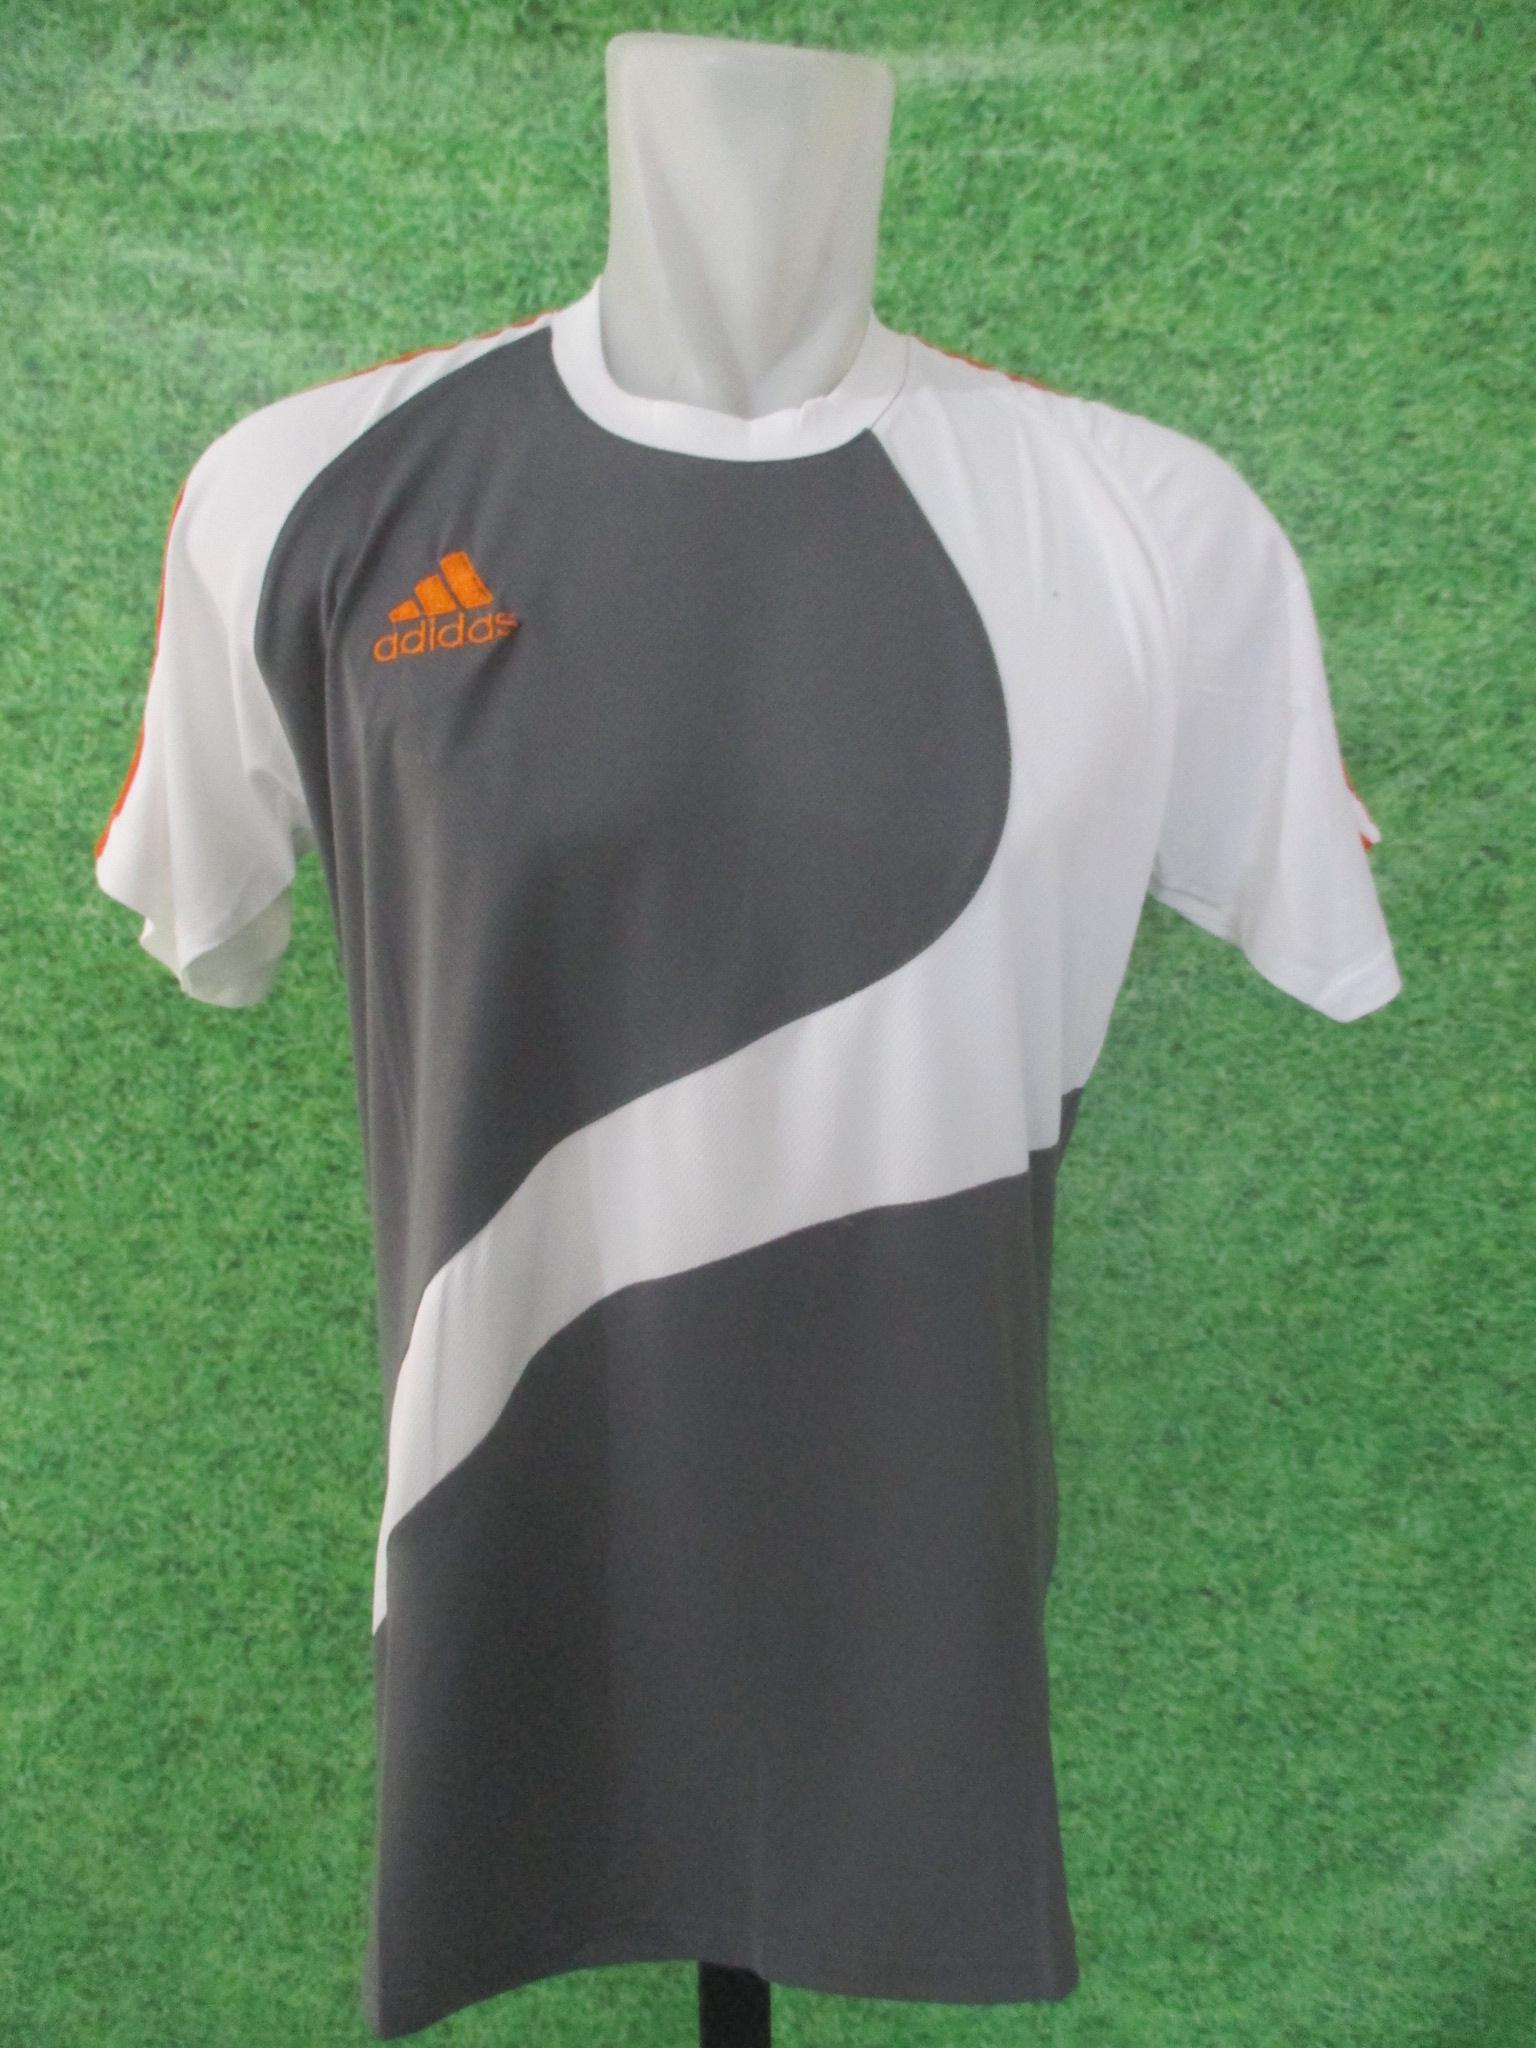 ObralanBaju.com Obral Baju Pakaian Murah Meriah 5000 Kaos Sport Dewasa